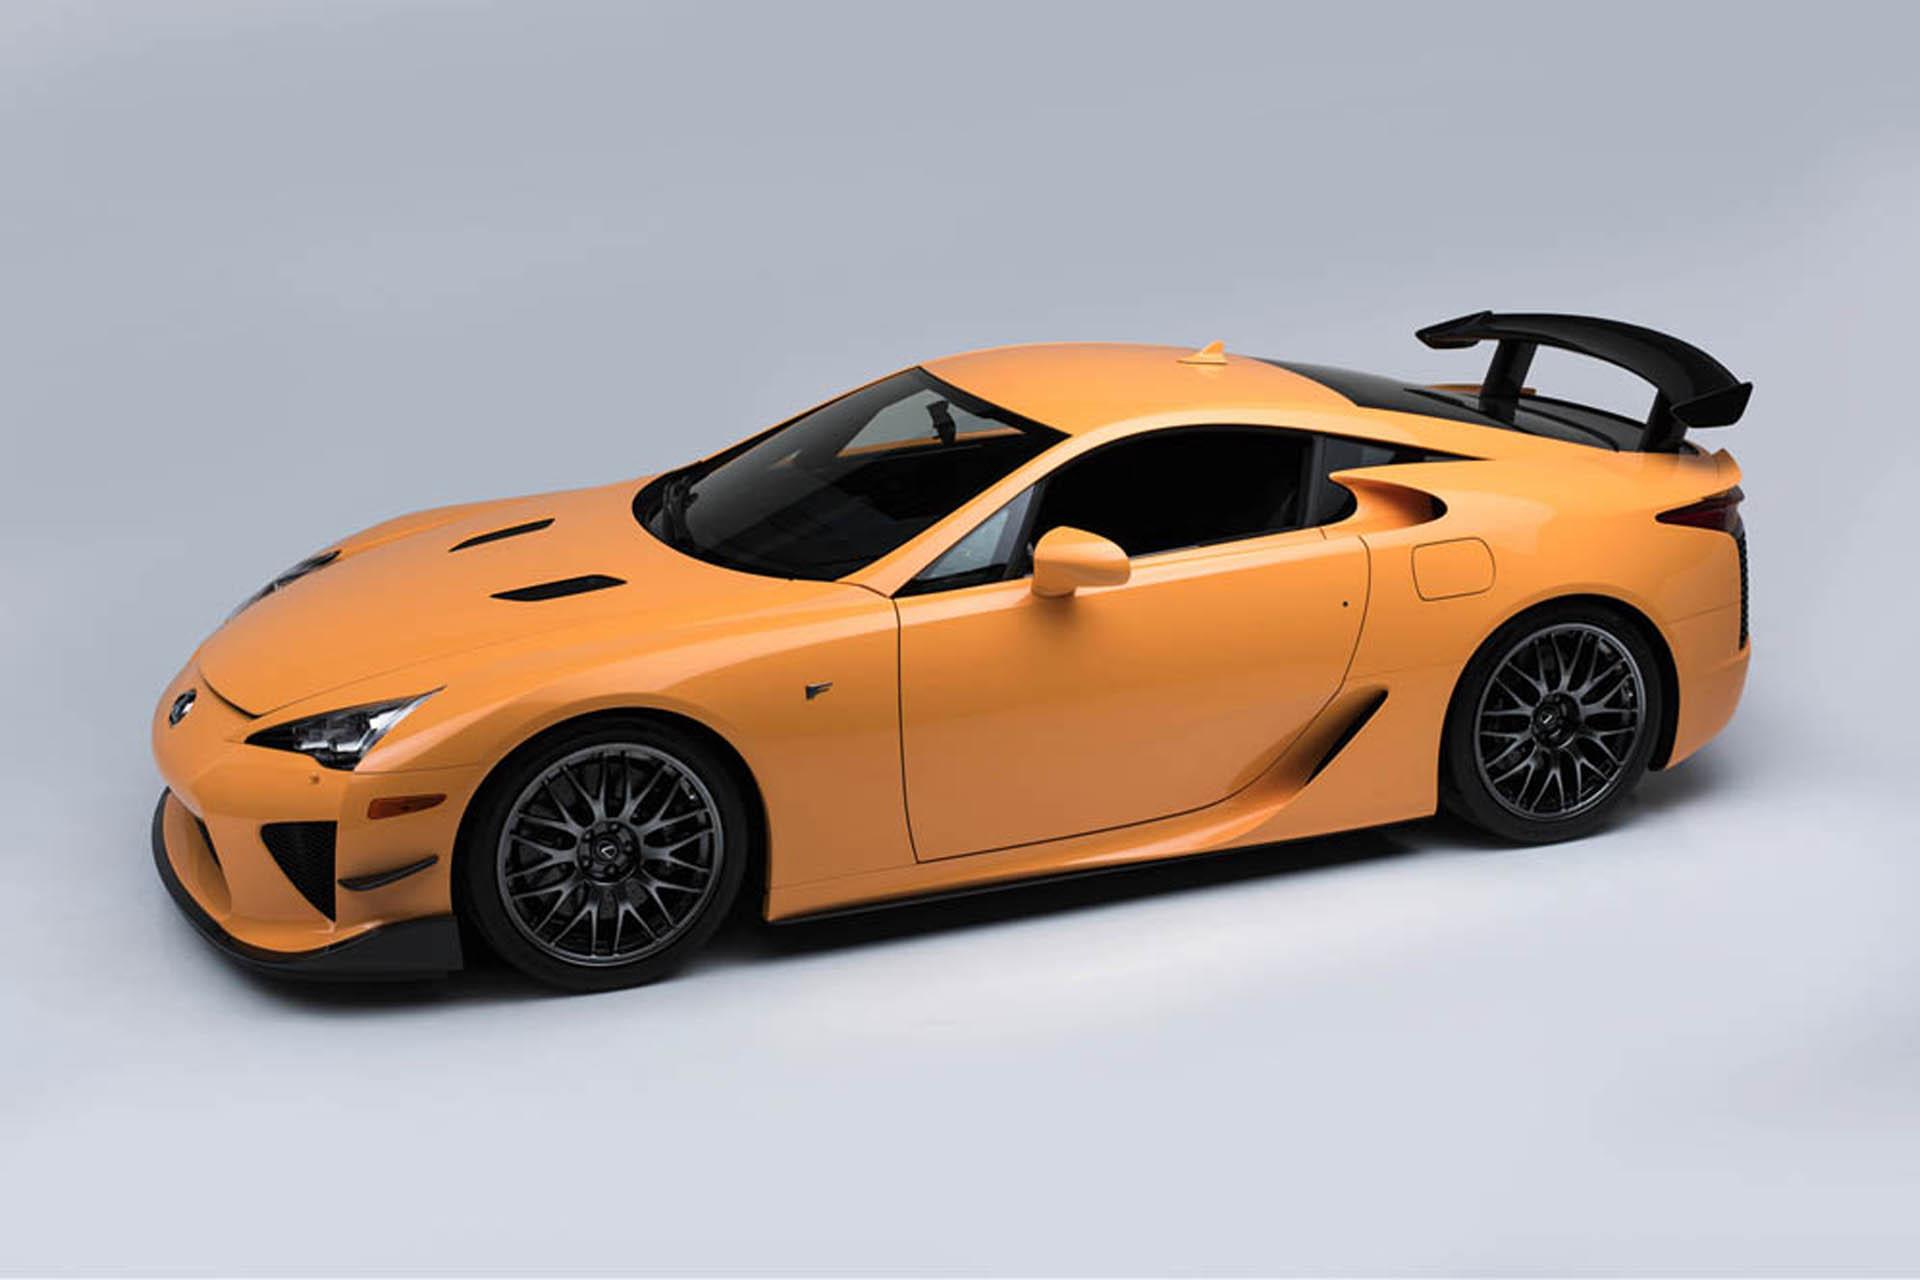 Lexus_LFA_Nurburgring_Edition_0005